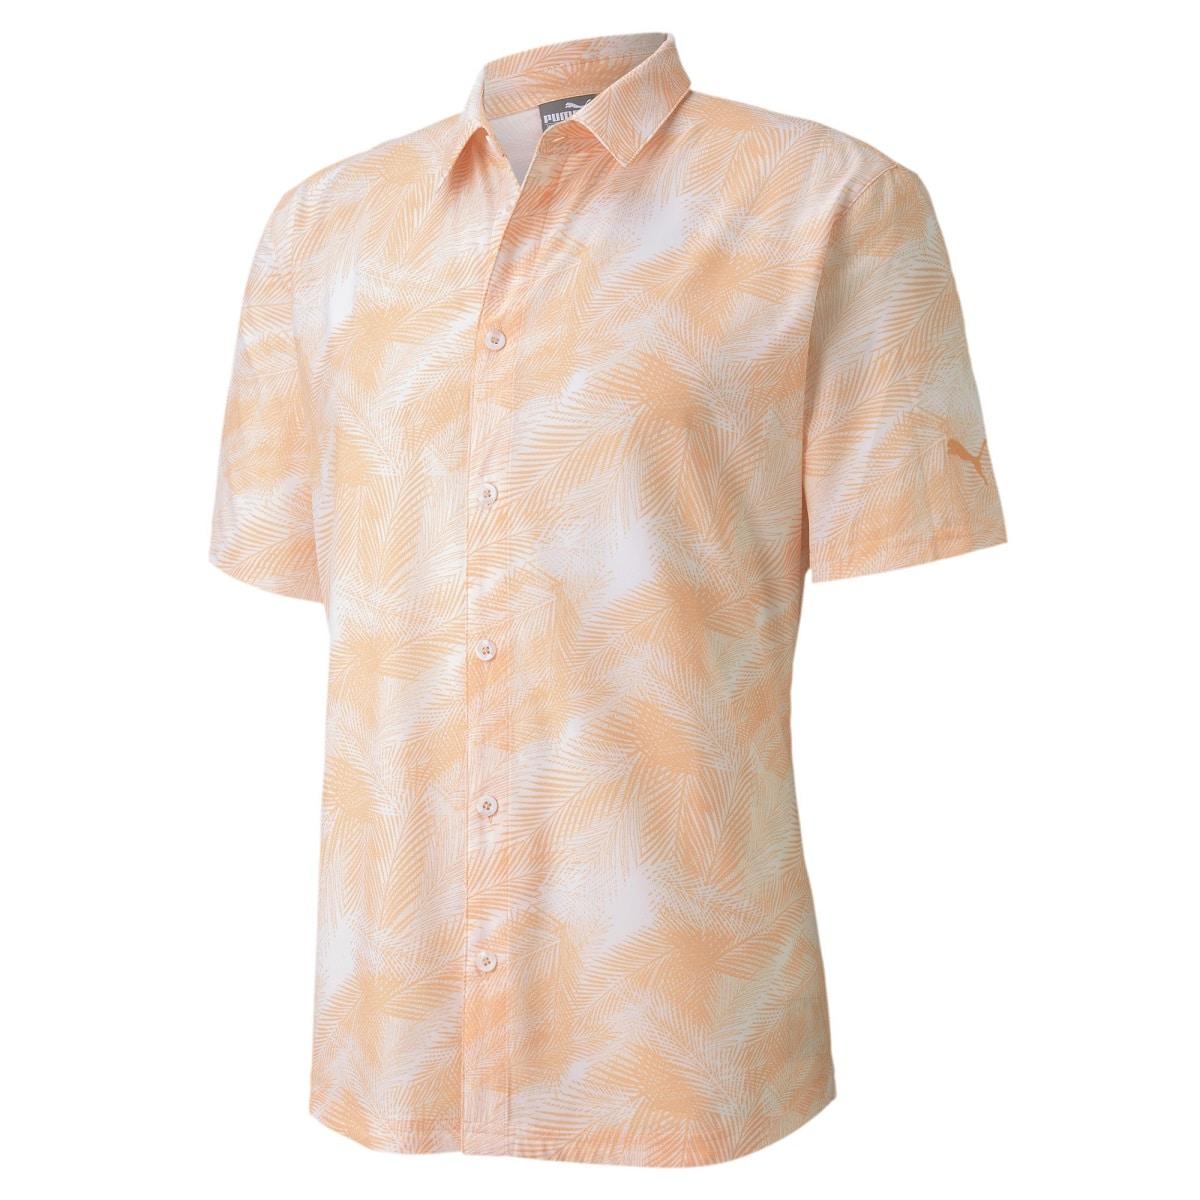 PUMA golf shirts